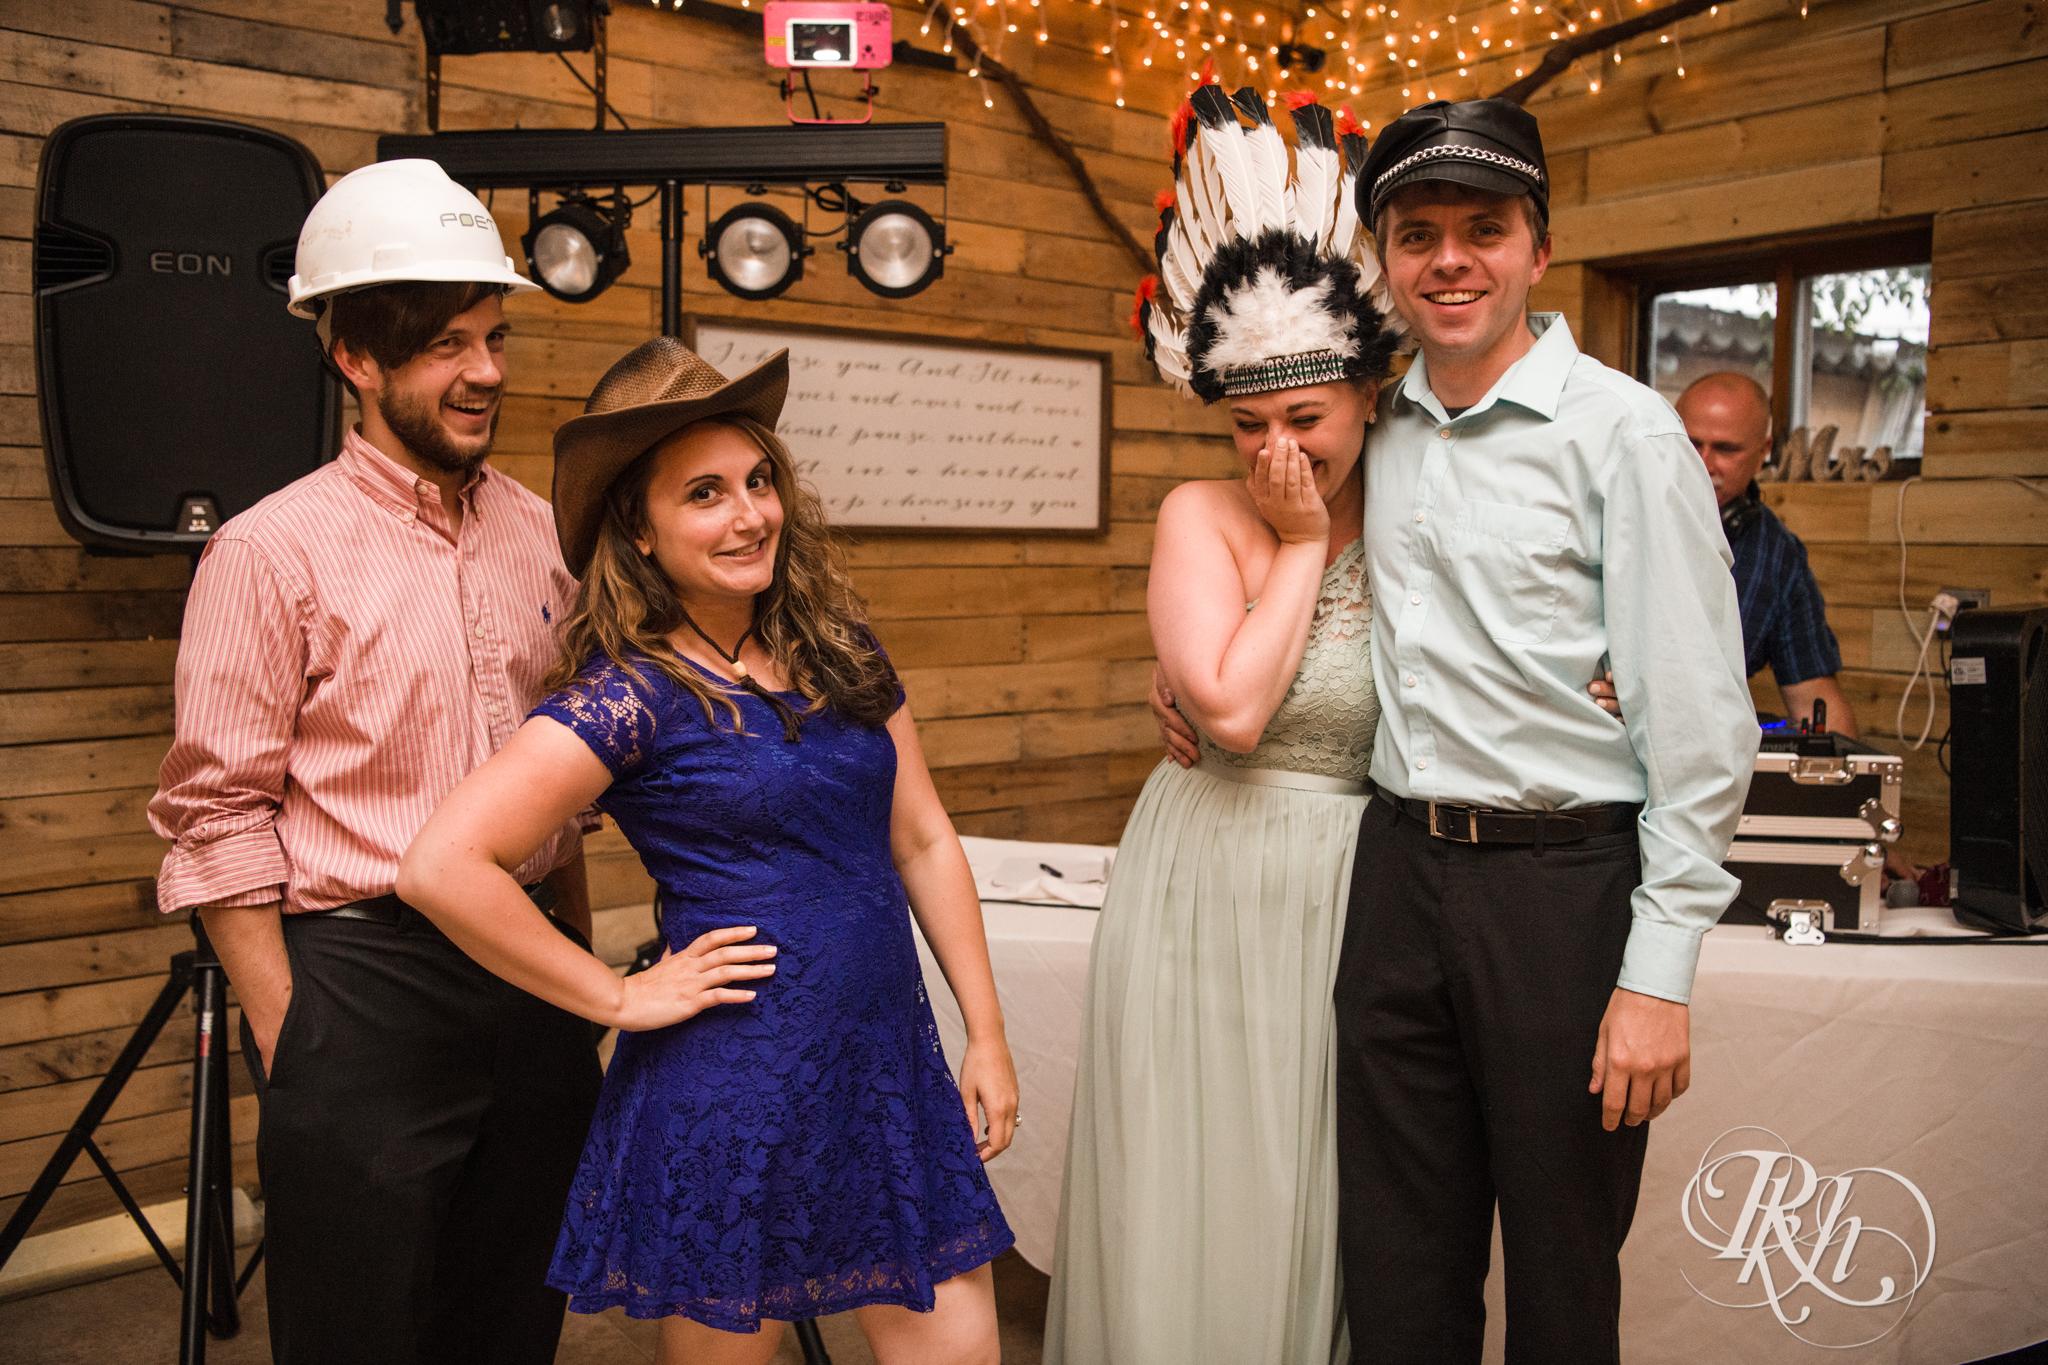 Ally & Nick - Minnesota Wedding Photography - Next Chapter Winery - RKH Images - Blog (49 of 57).jpg